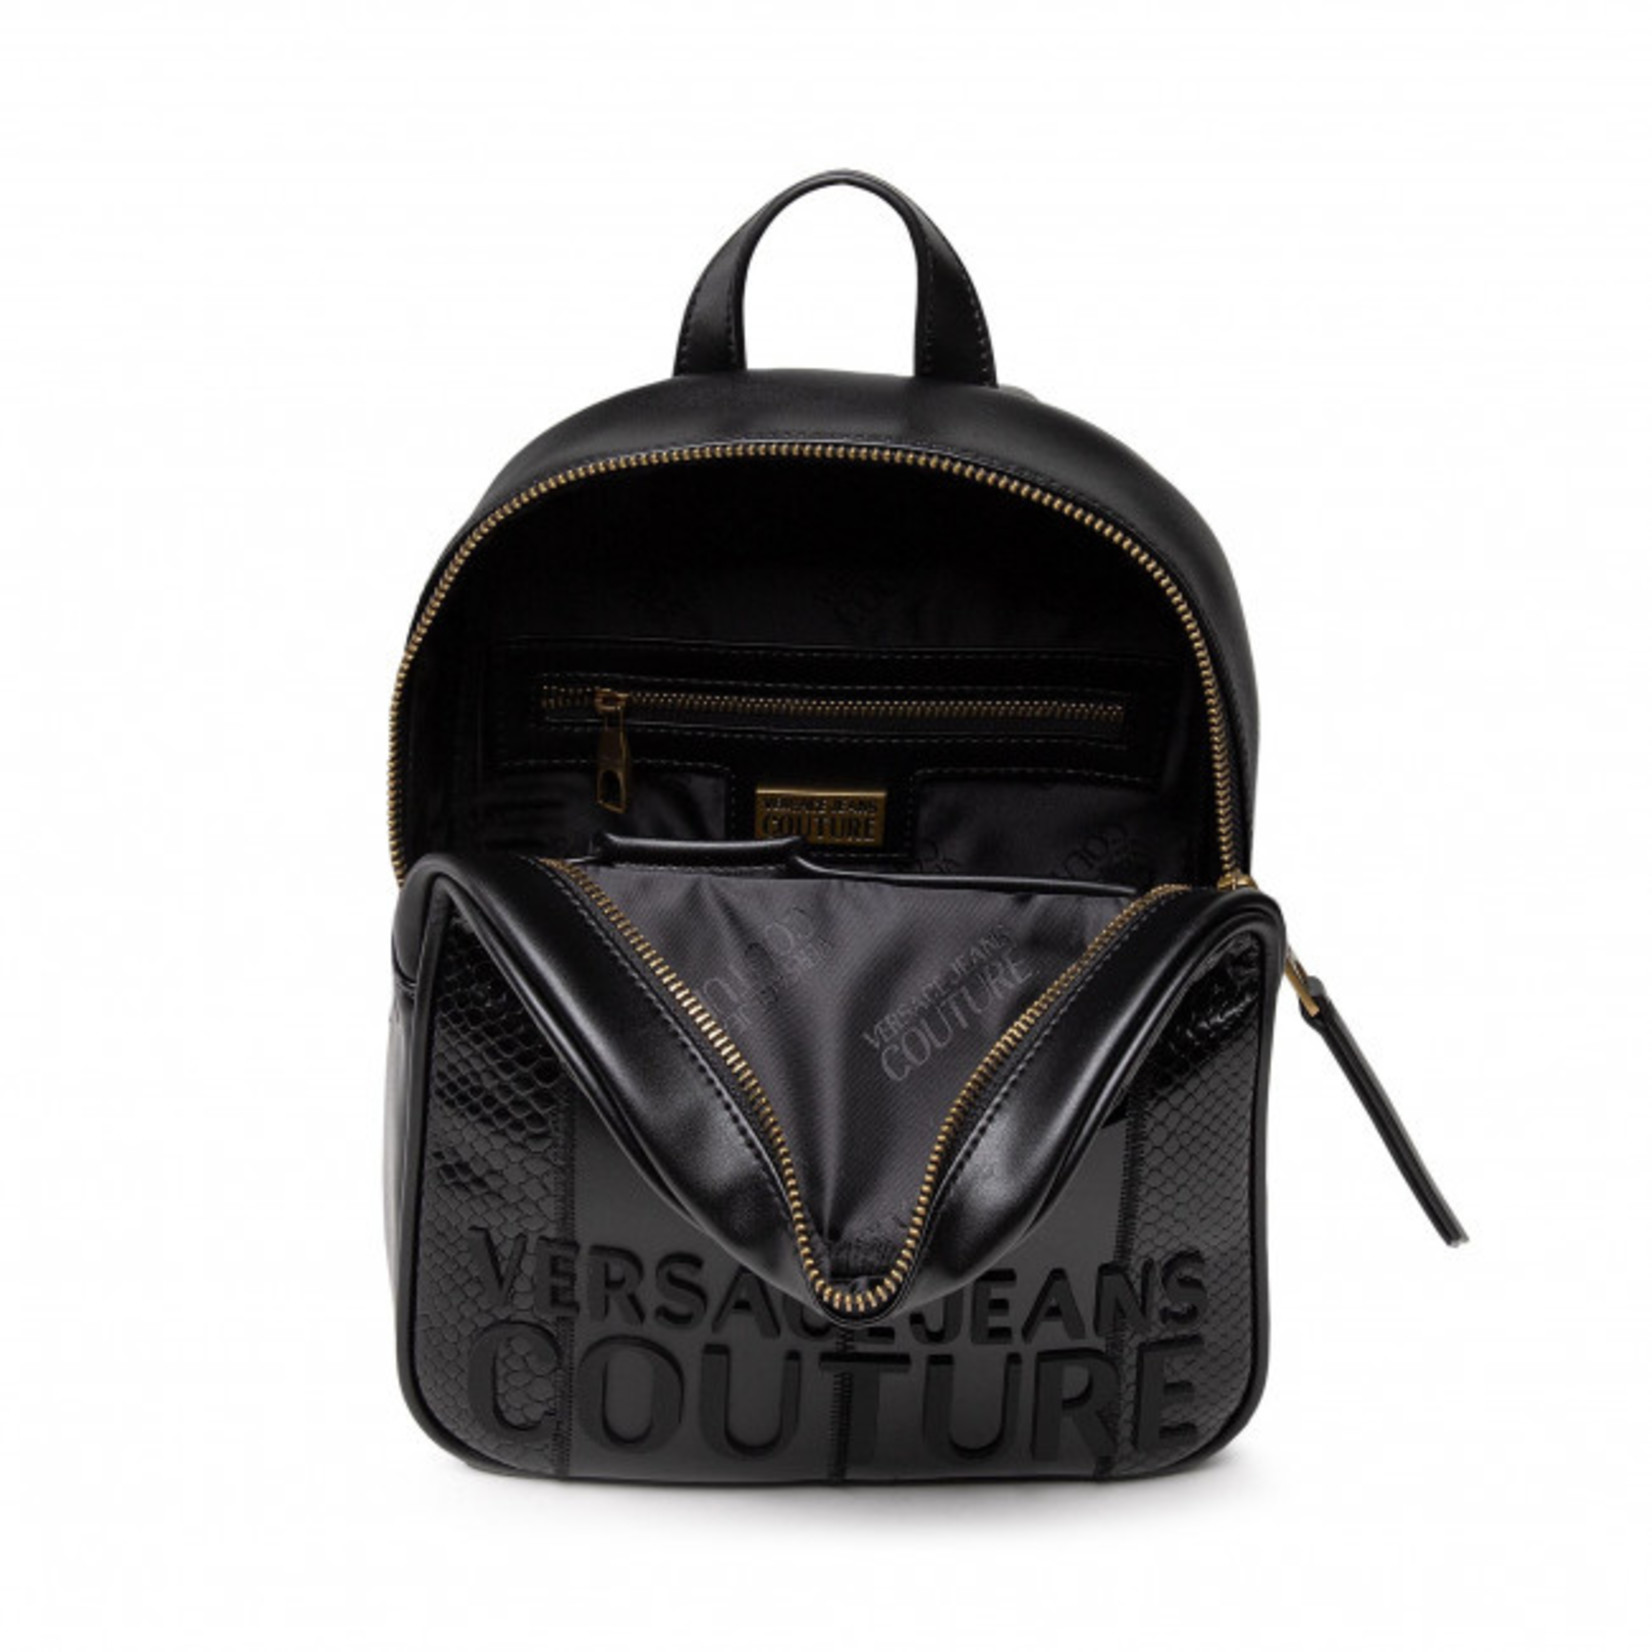 VERSACE JEANS COUTURE VERSACE JEANS COUTURE WOMEN'S BAG RANGE 4  STRIPE PATCHWORK - 71VA4B47